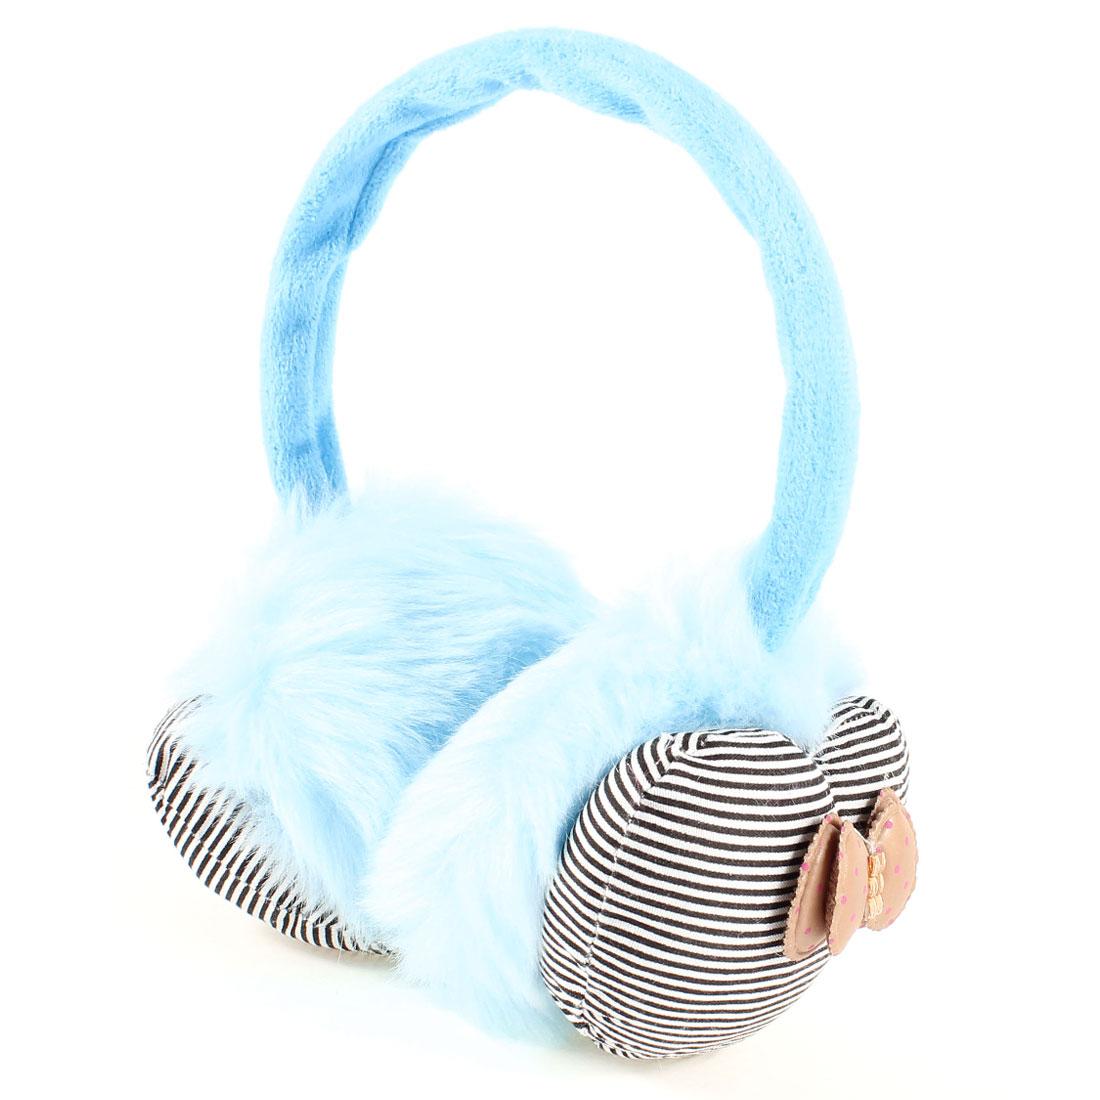 Lady Blue Plush Stripe Print Heart Shaped Bowkont Decor Winter Ear Warmers Cover Earmuffs